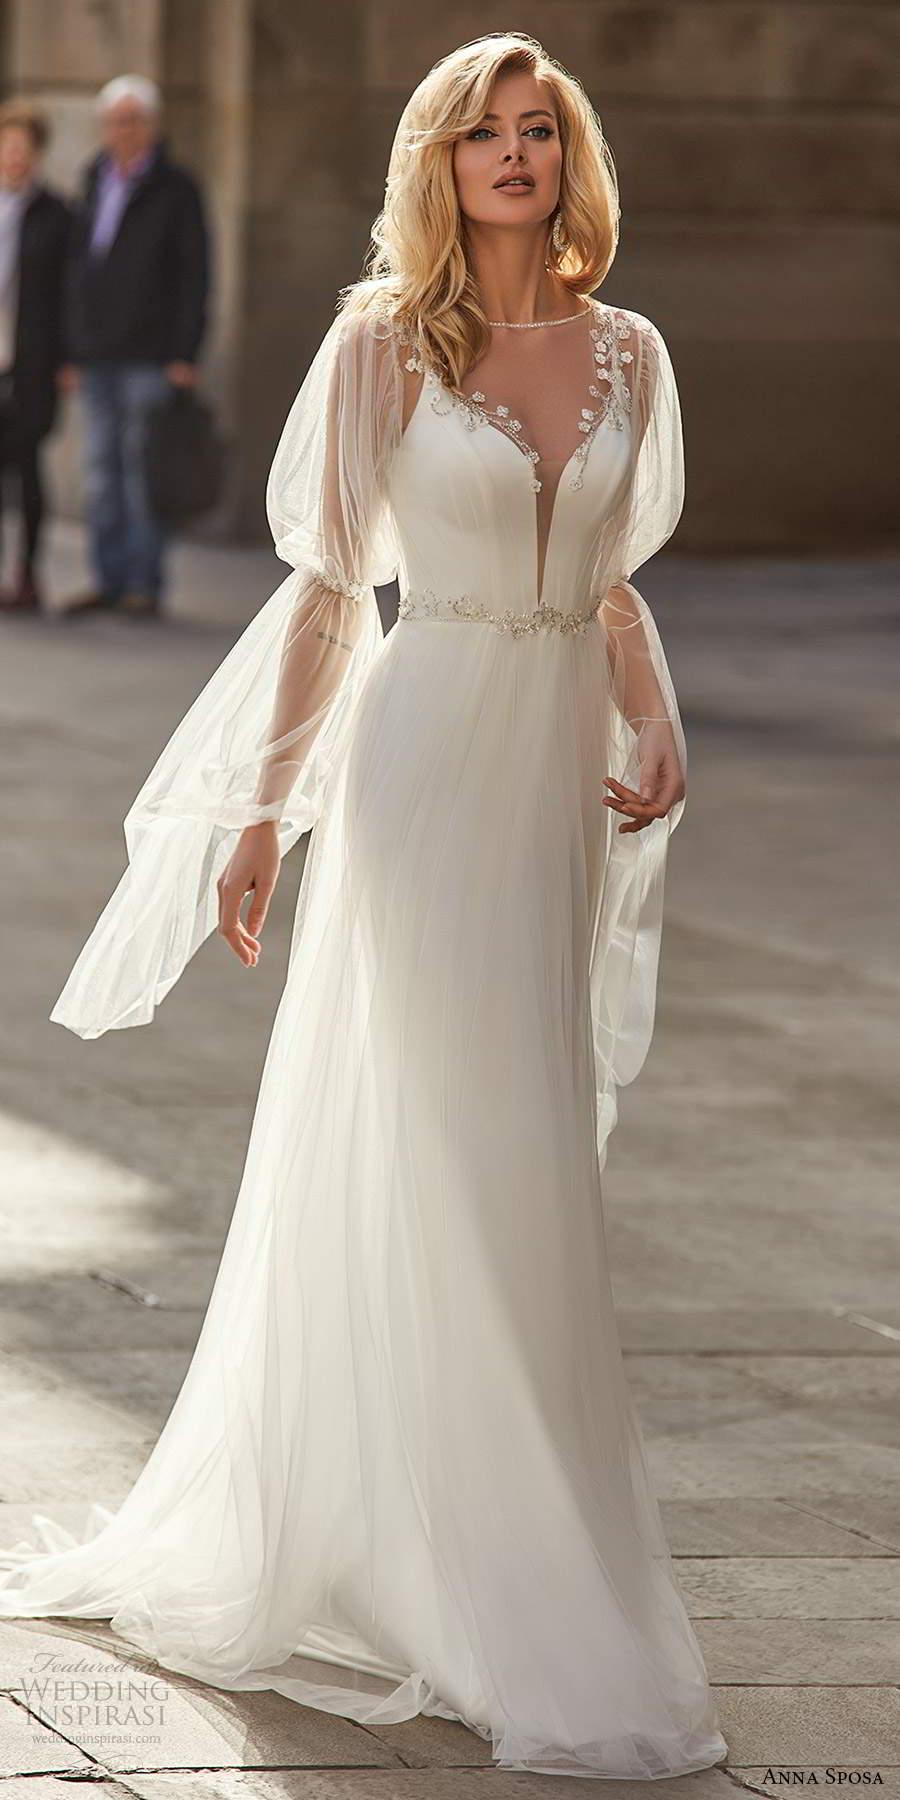 anna sposa 2021 bridal illusion bell sleeves sleeveless straps plunging v neckline clean minimalist sheath wedding dress high slit swep train (5) mv